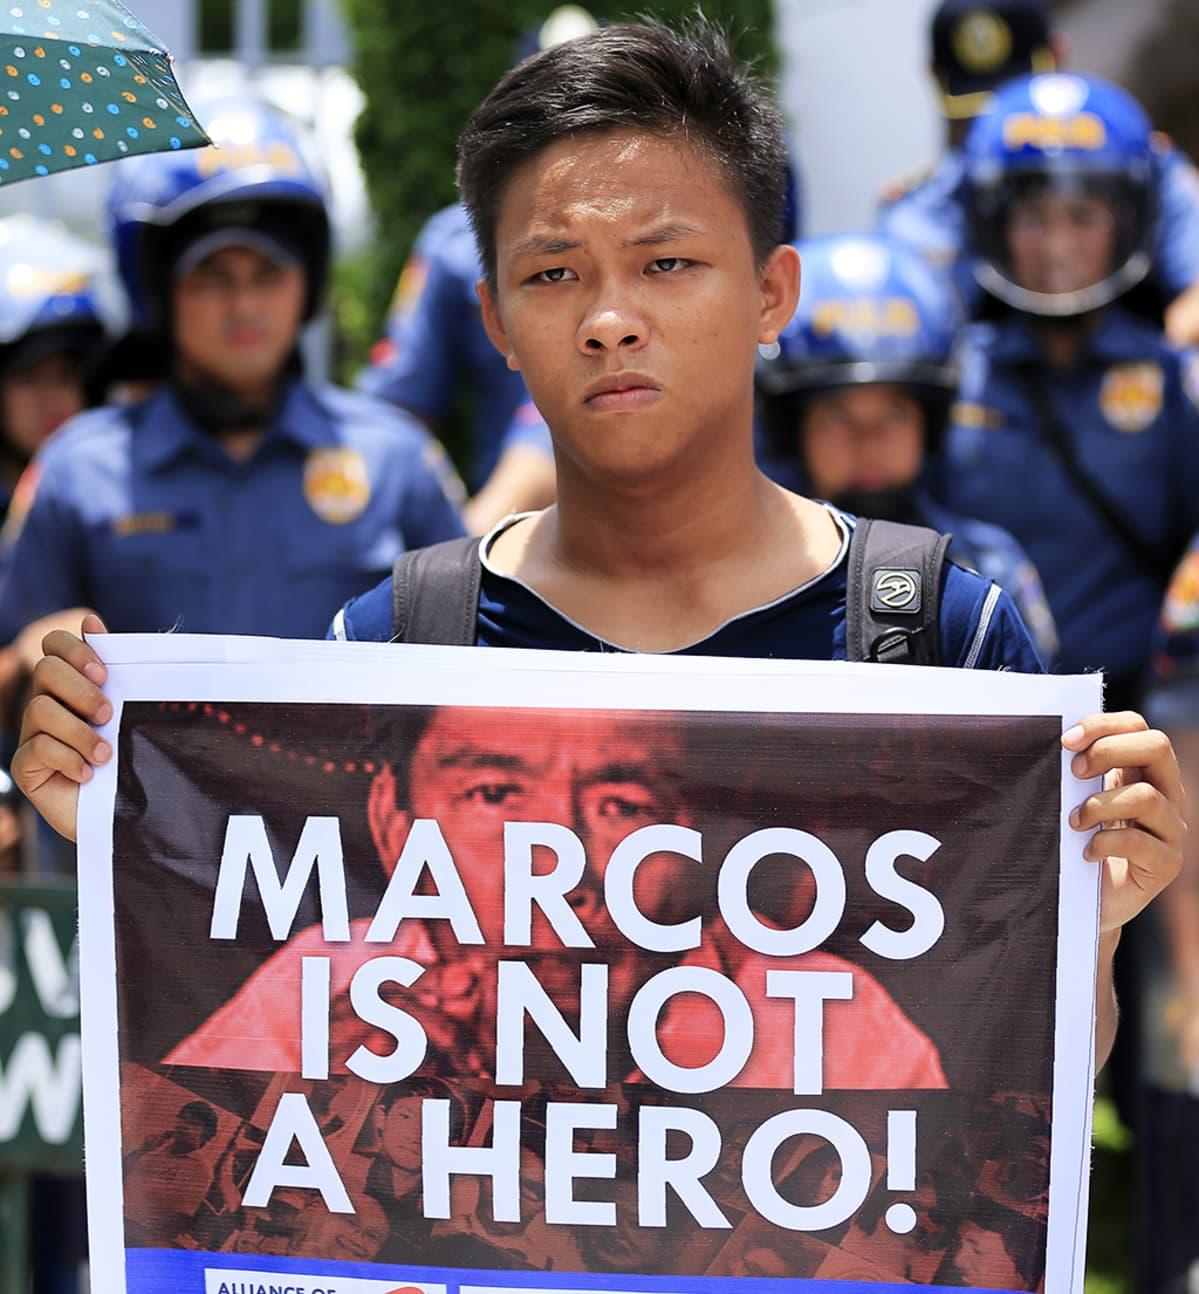 Nuori mies mielenosoituksessa.